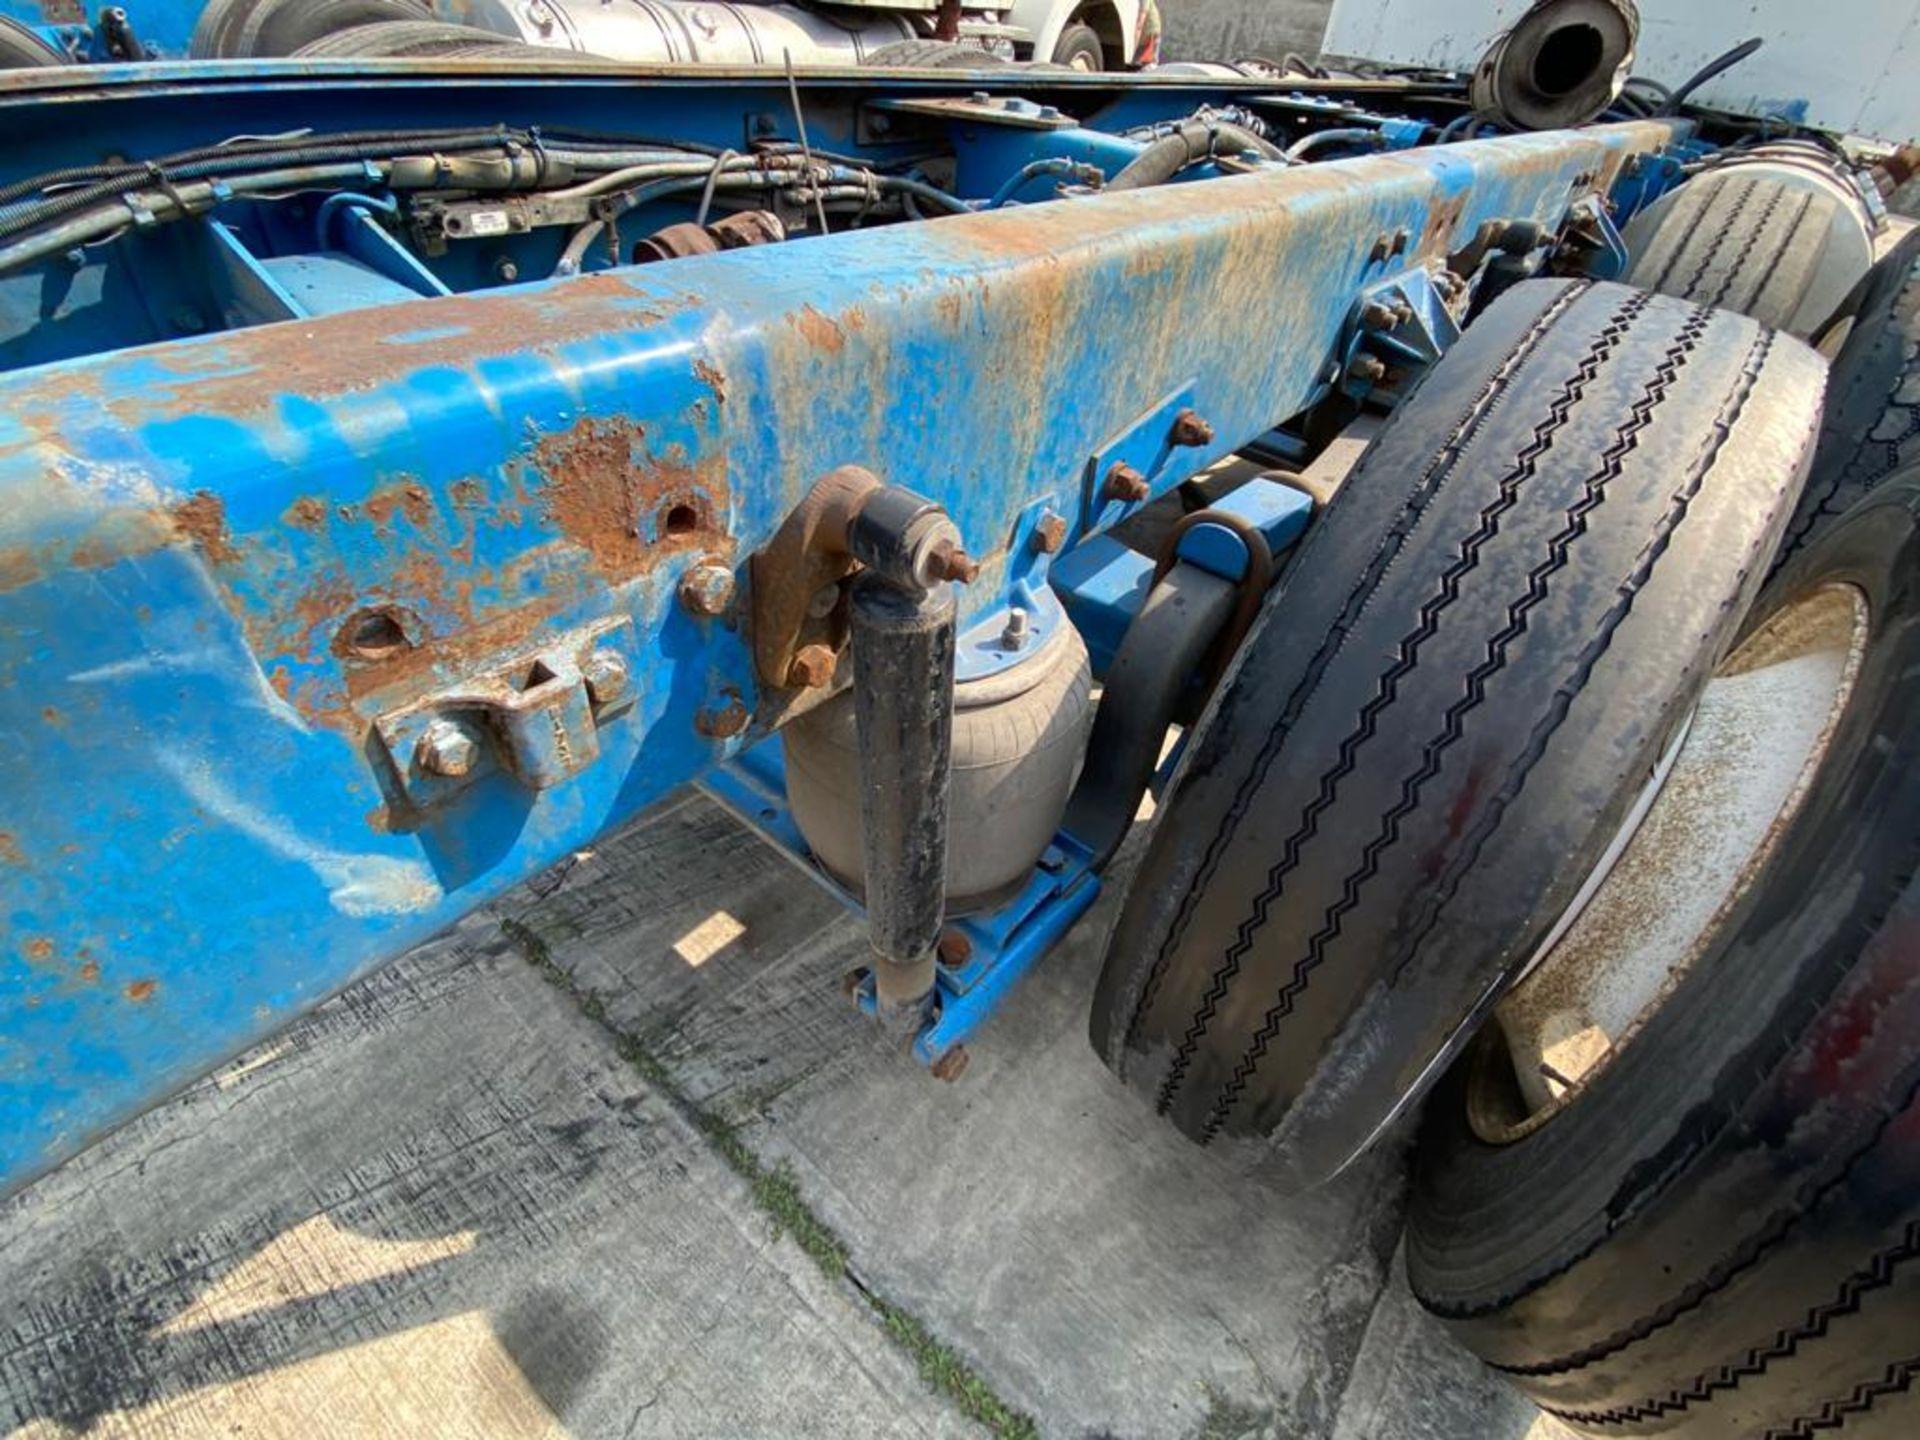 1999 Kenworth Sleeper truck tractor, standard transmission of 18 speeds - Image 20 of 72